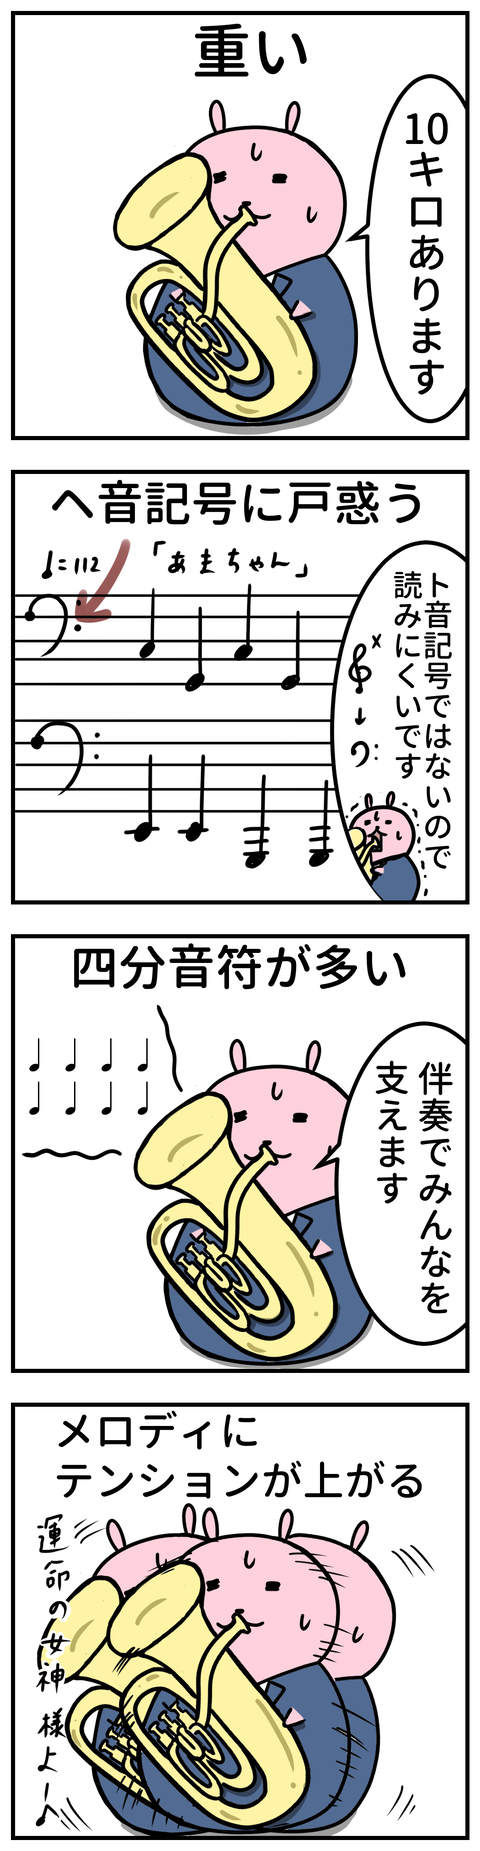 manga-yuzuporo80-1